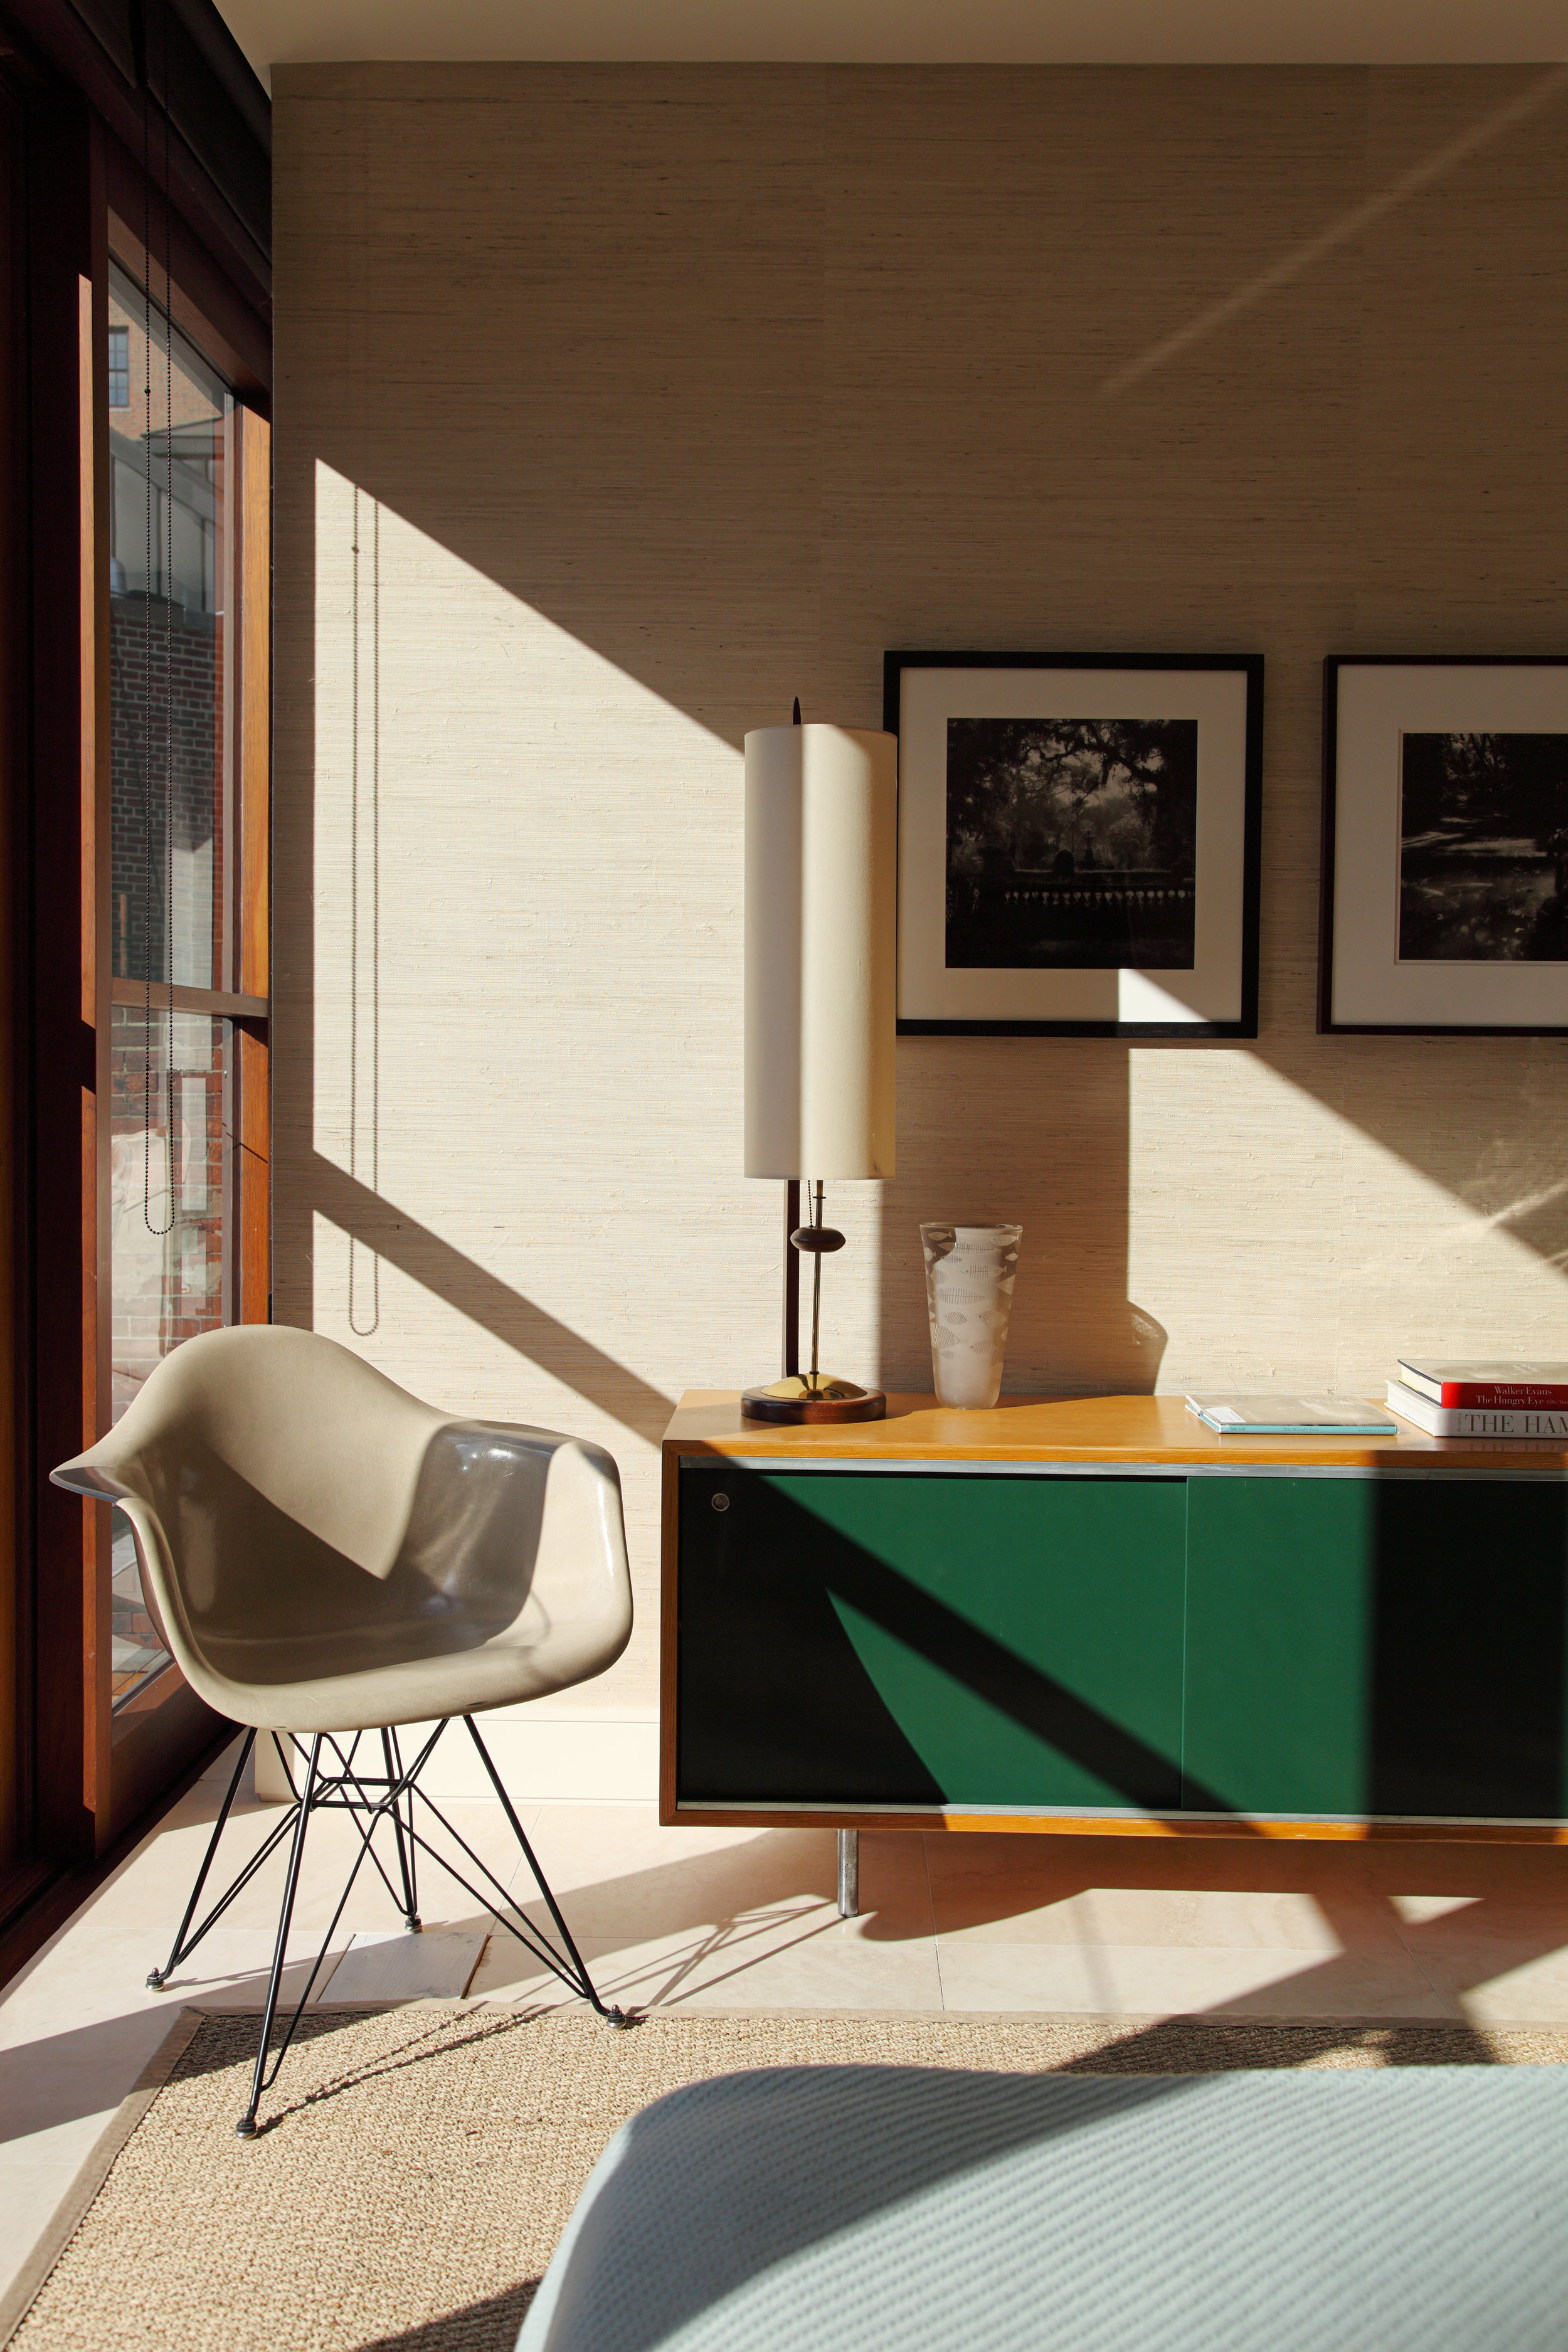 ATI - EB Bedroom Chair Vignette.jpg